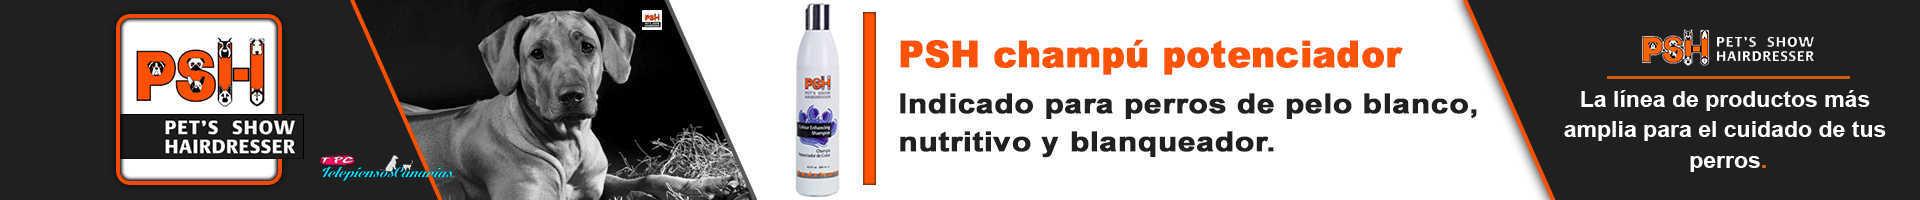 PSH champú nutritivo potenciador de manto blanco